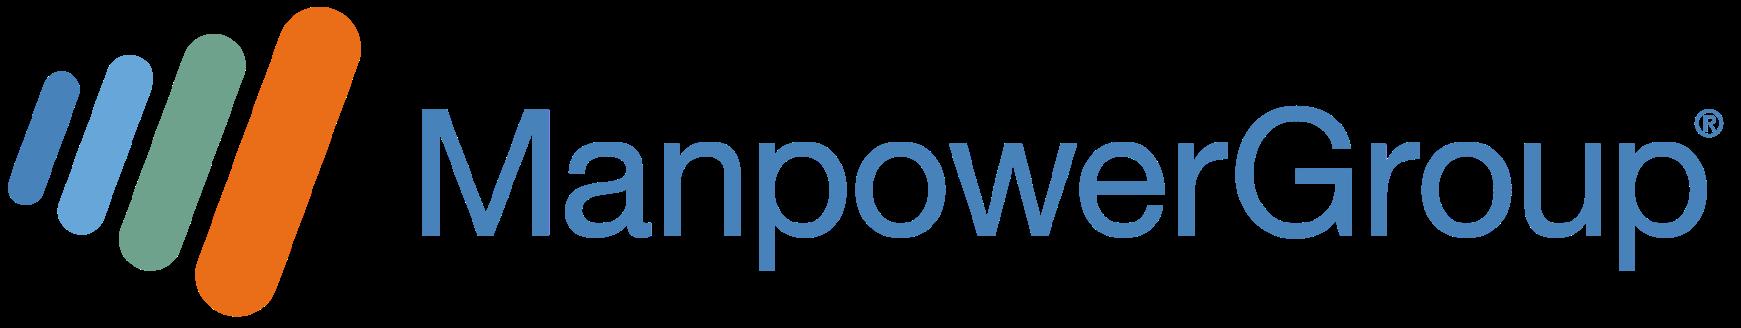 logo_manpowergroup_mpg